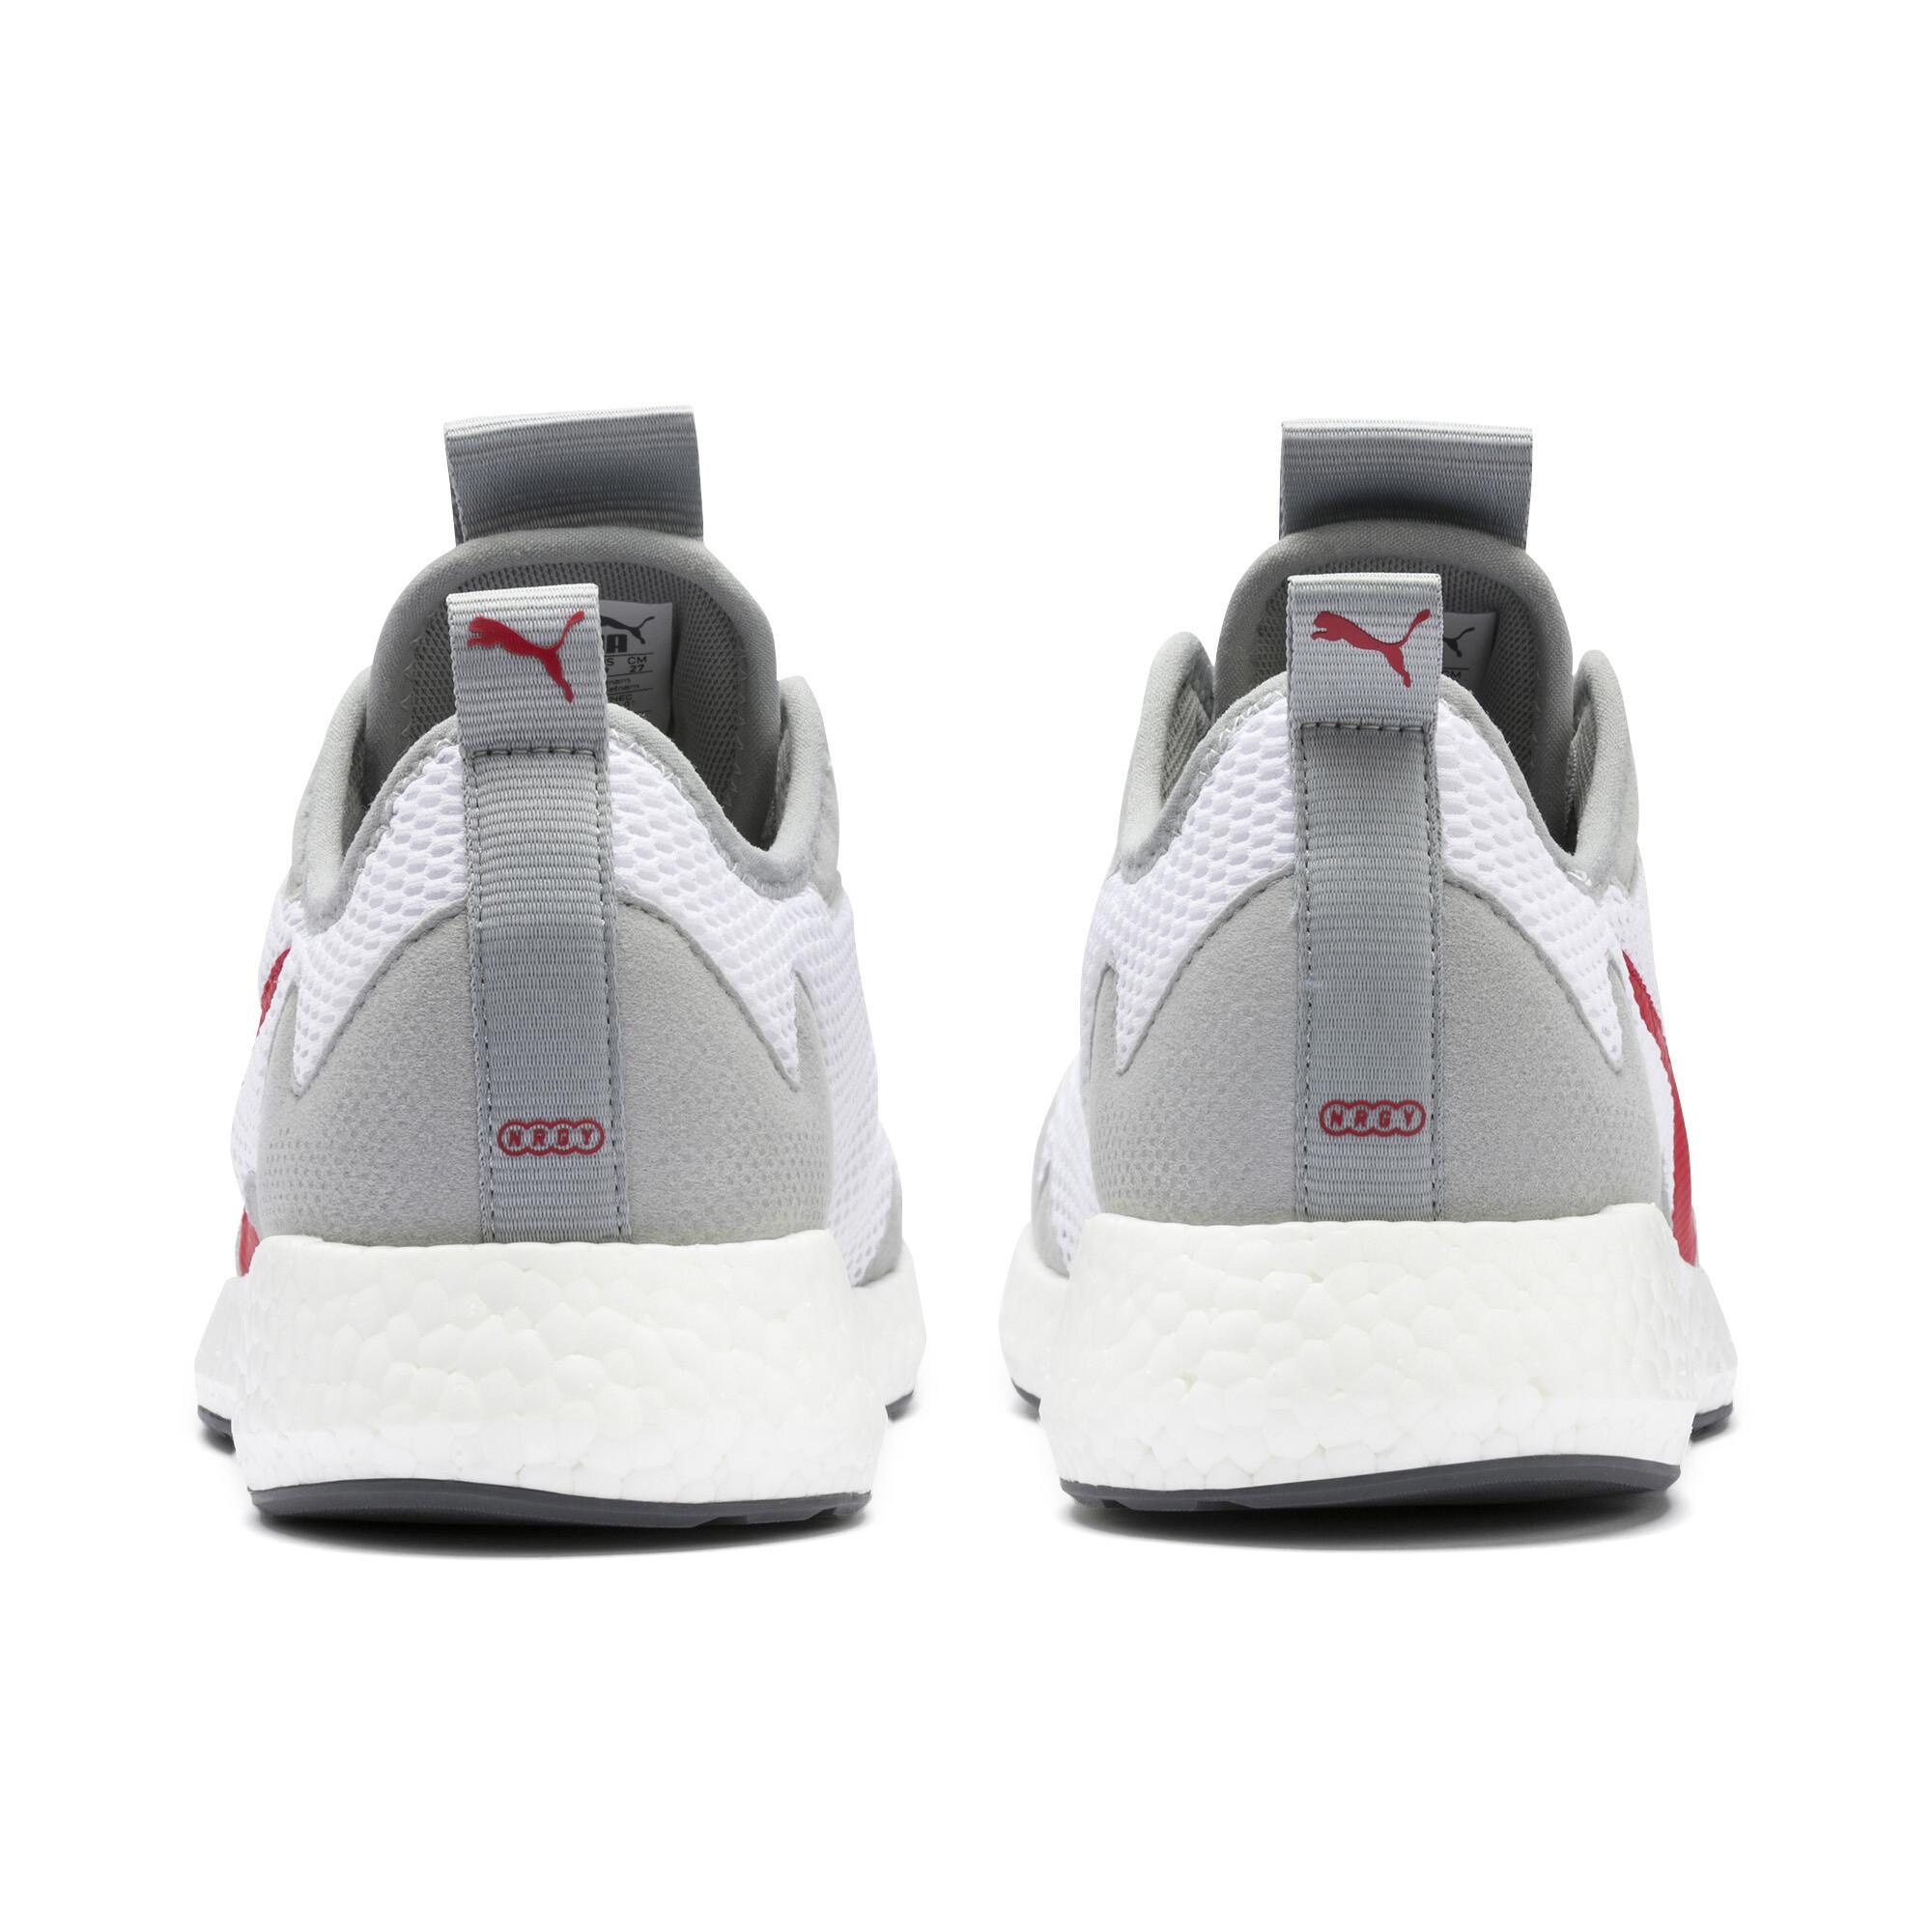 PUMA-NRGY-Neko-Skim-Men-s-Running-Shoes-Men-Shoe-Running thumbnail 3